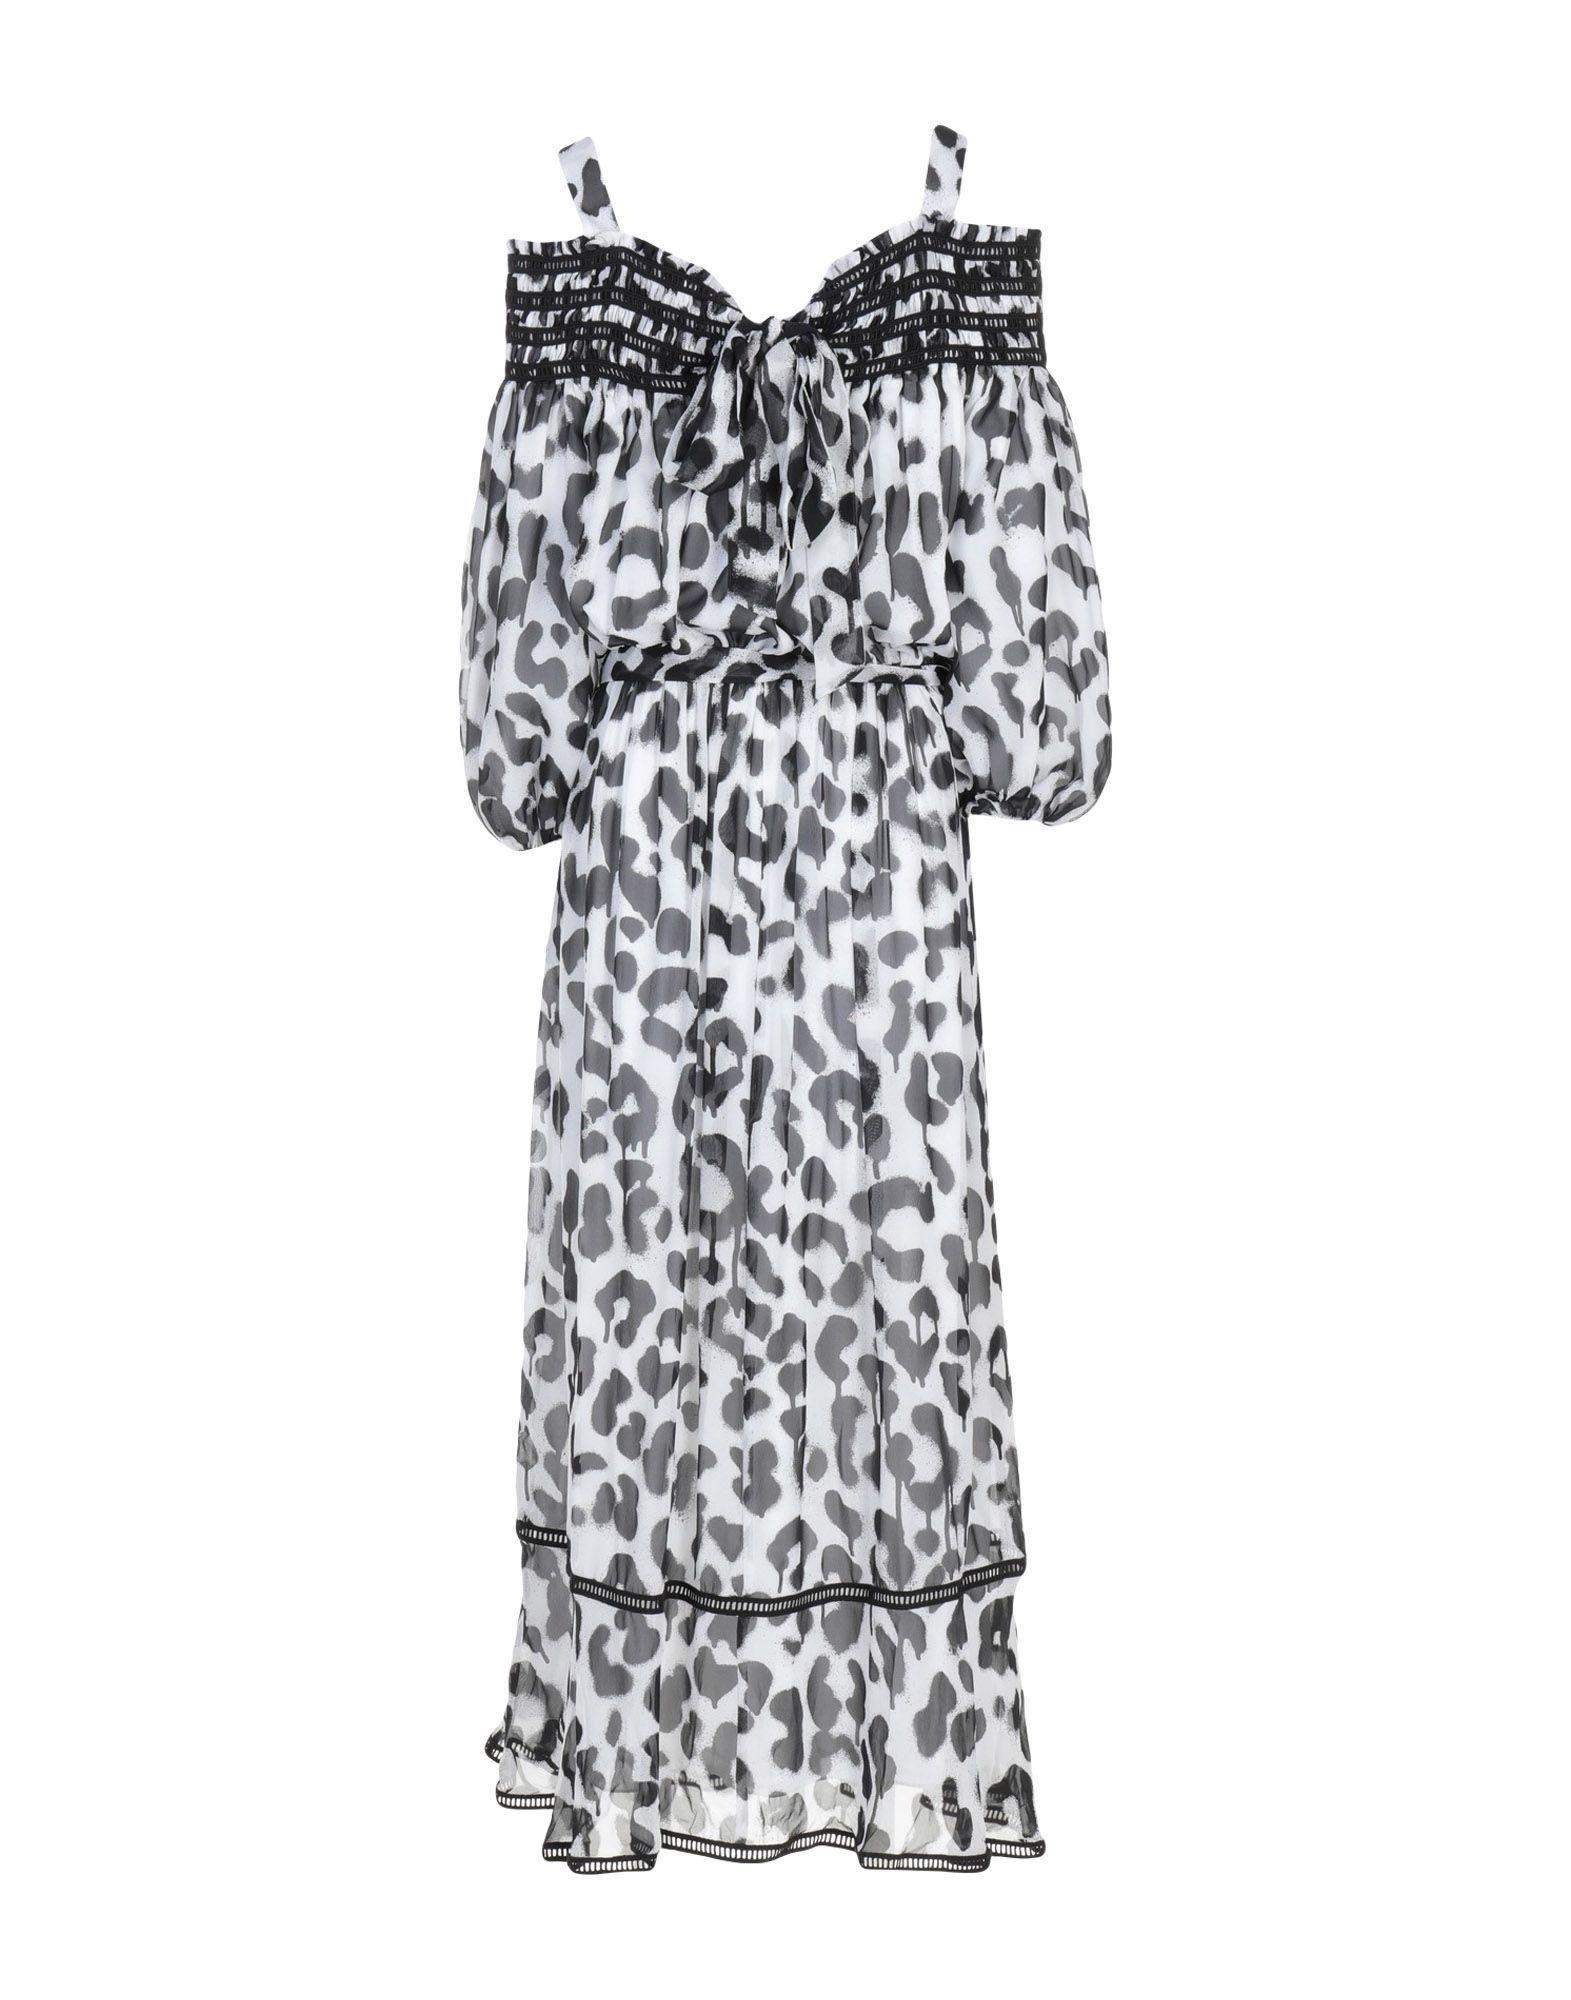 Boutique Moschino White Print Silk Dress